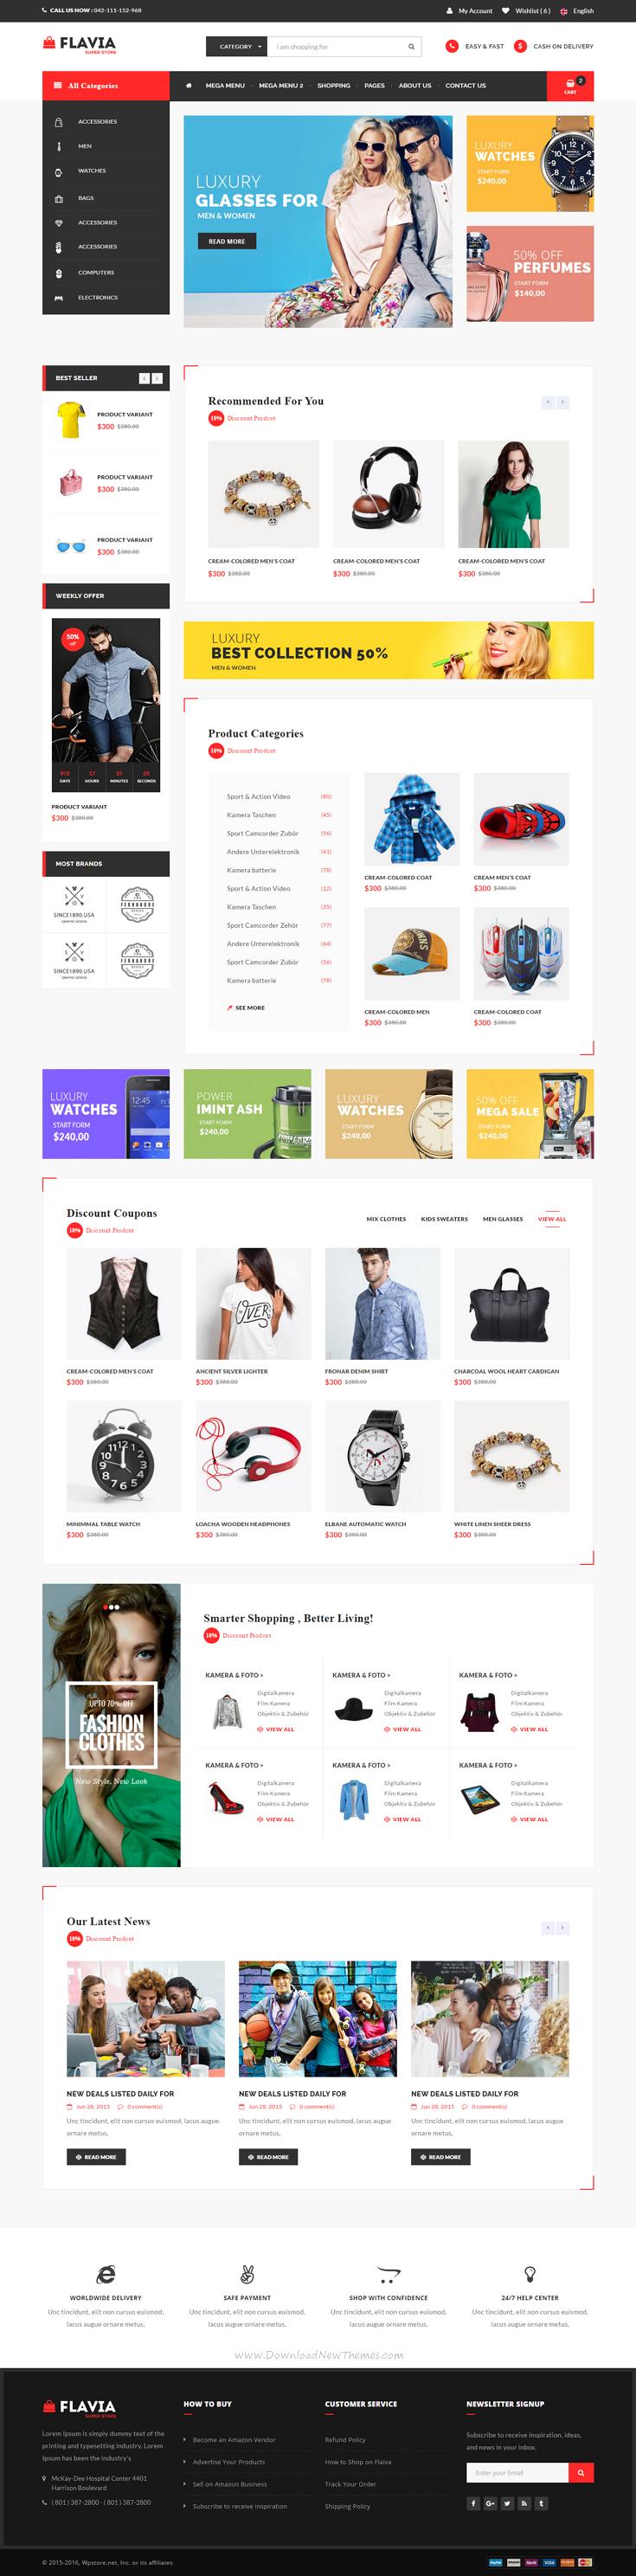 Pin By Ellion Wise On Web Design In 2018 Pinterest Website